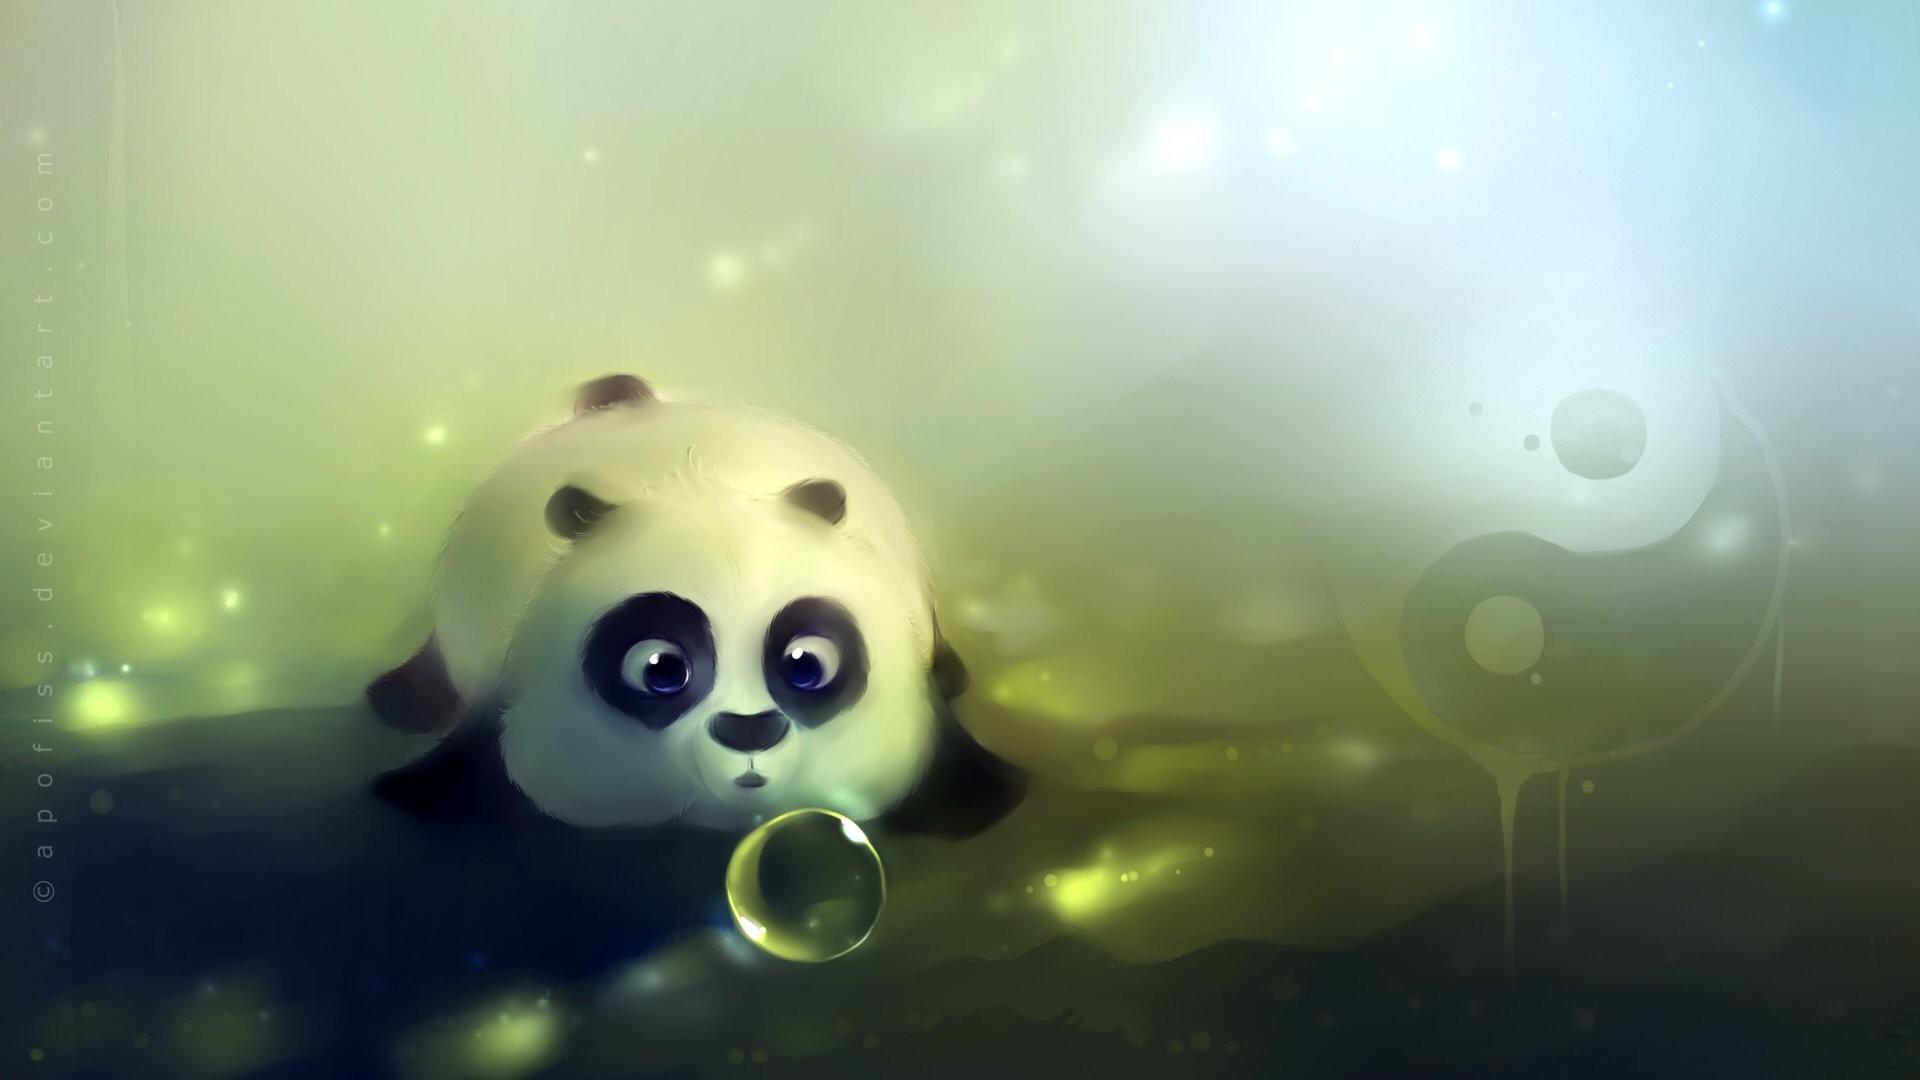 Res: 1920x1080, HD Wallpaper | Background Image ID:145977.  Animal Panda